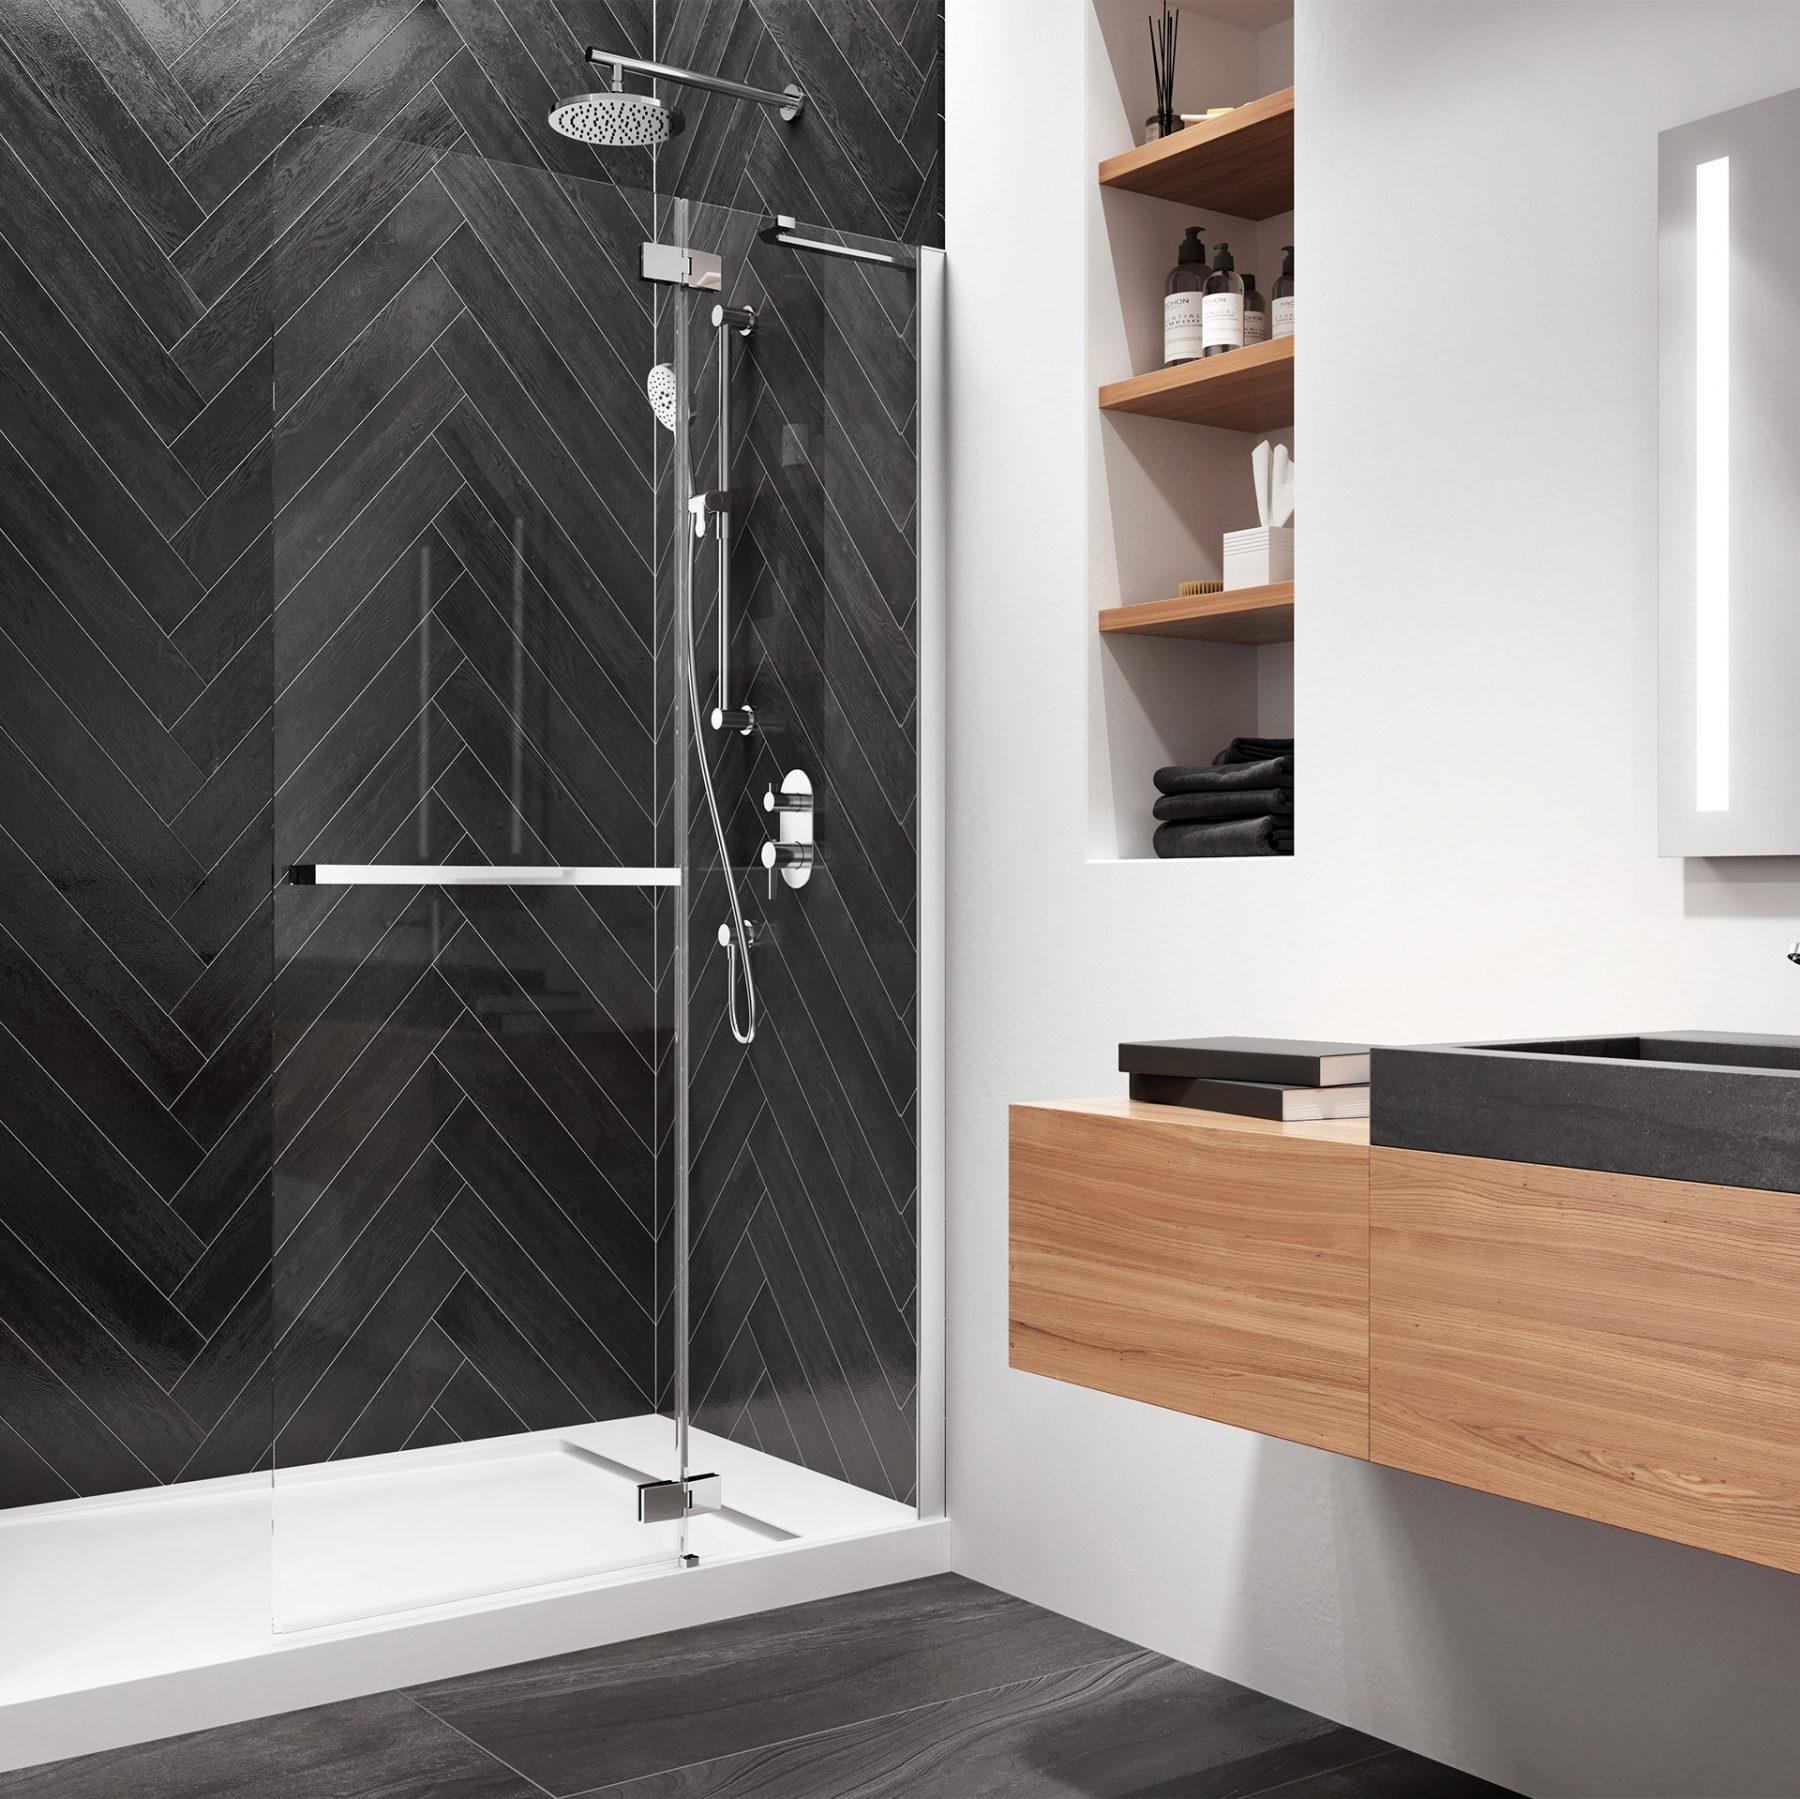 rendu-3d-photorealiste-noir-salle-de-bain